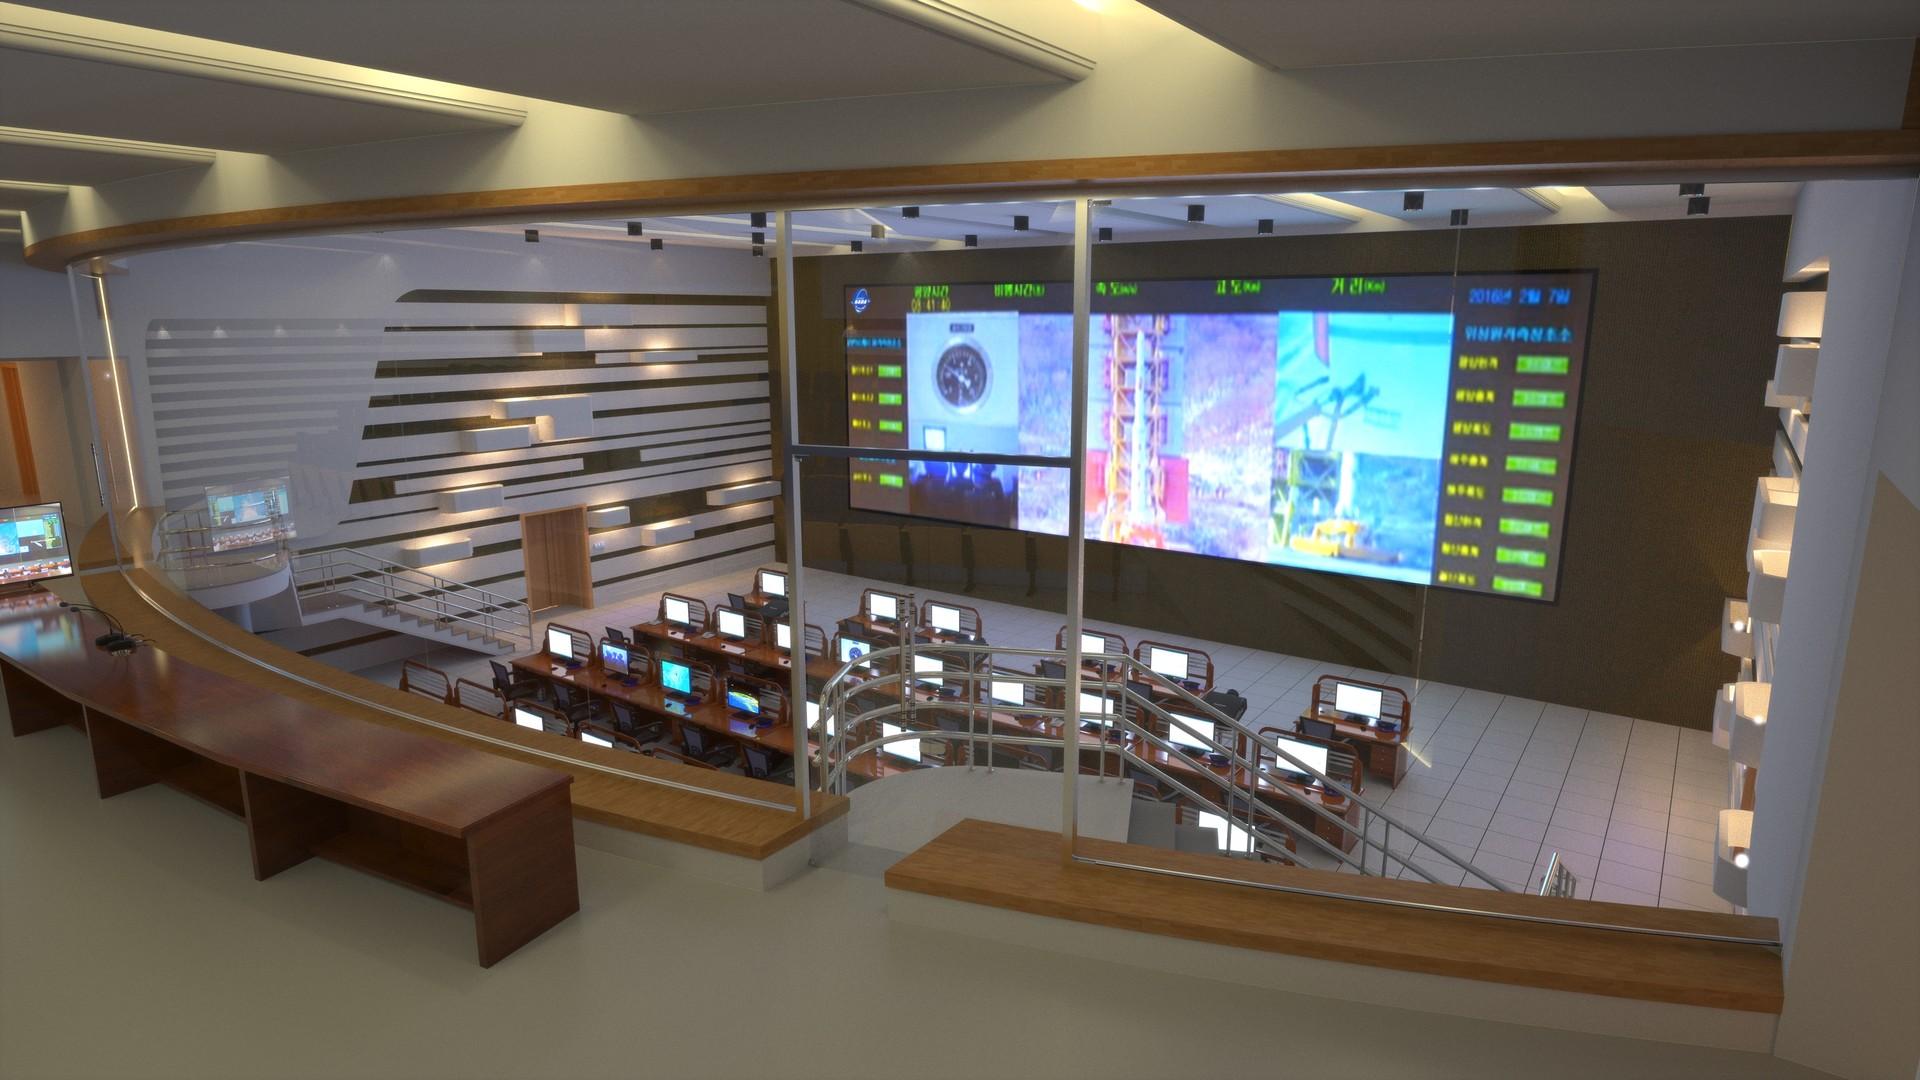 Duane kemp 10 control center balcony dk 04 a 02